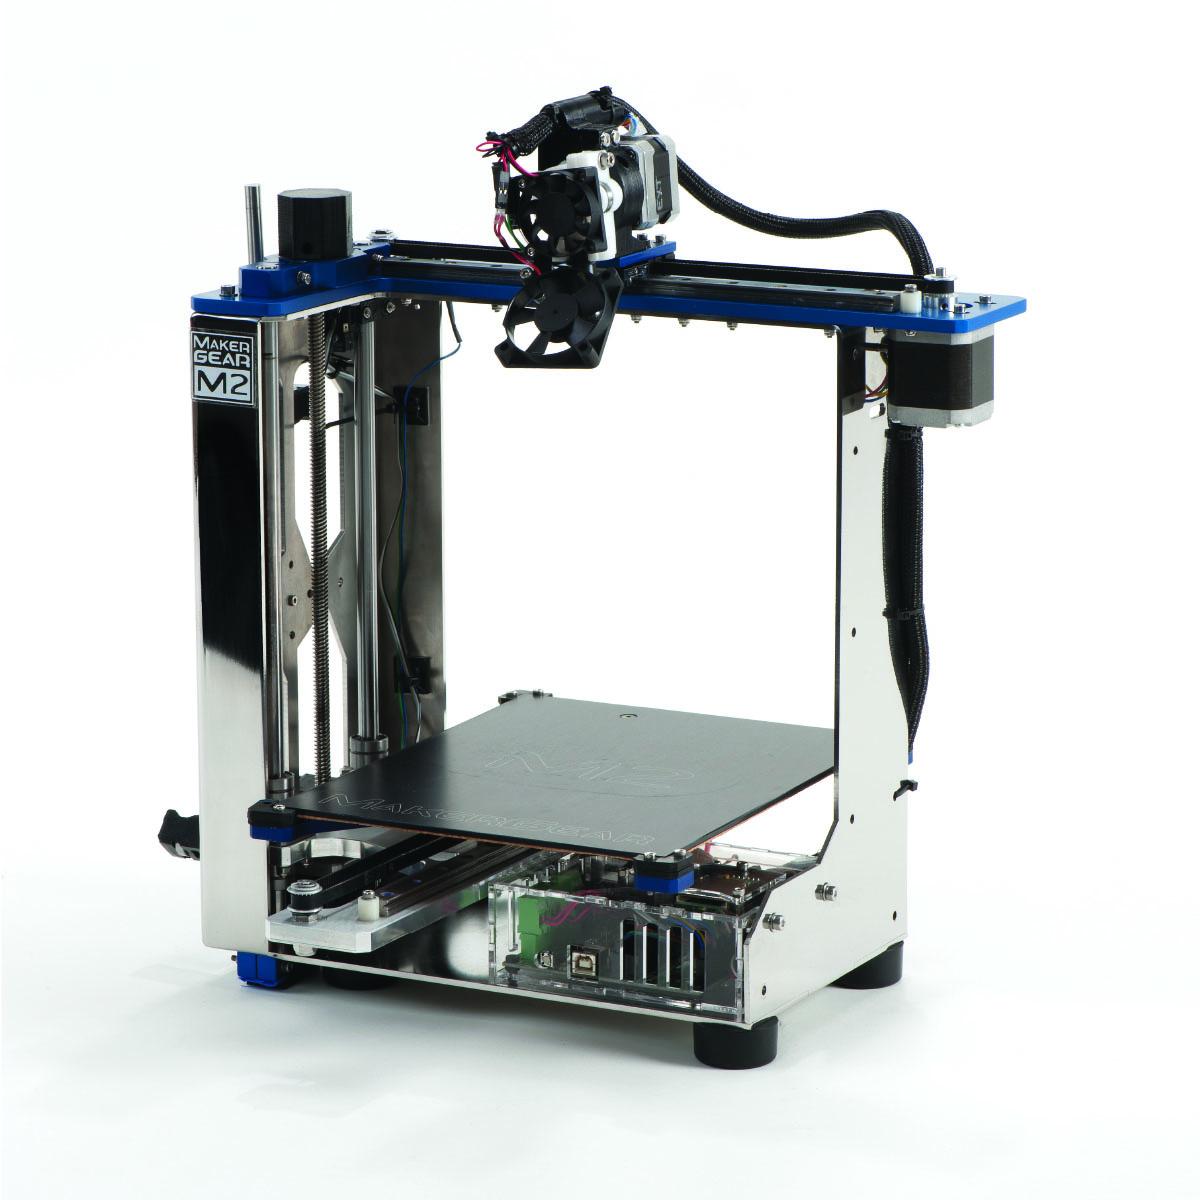 MakerGear M2